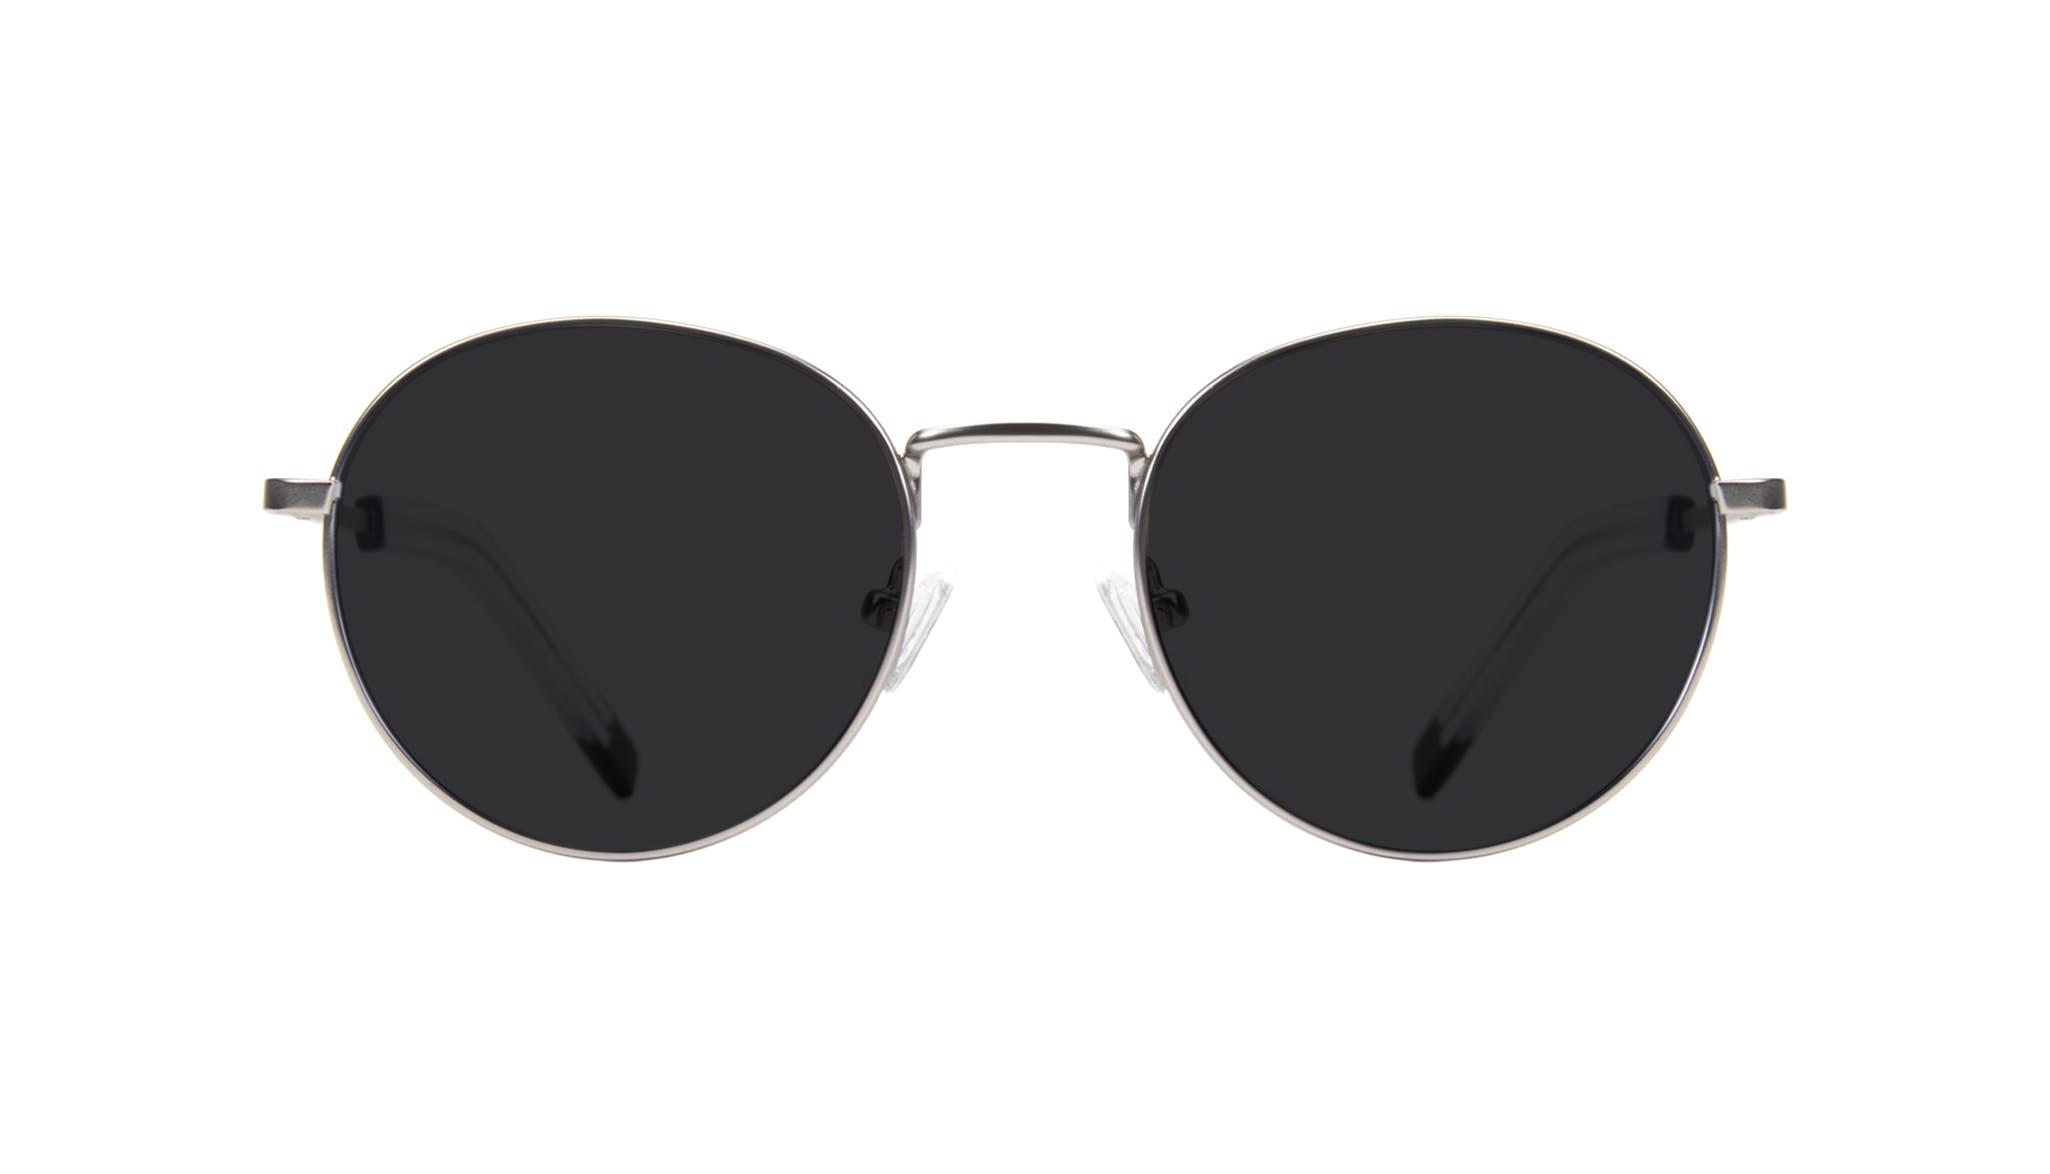 Affordable Fashion Glasses Round Eyeglasses Men Lean Steel